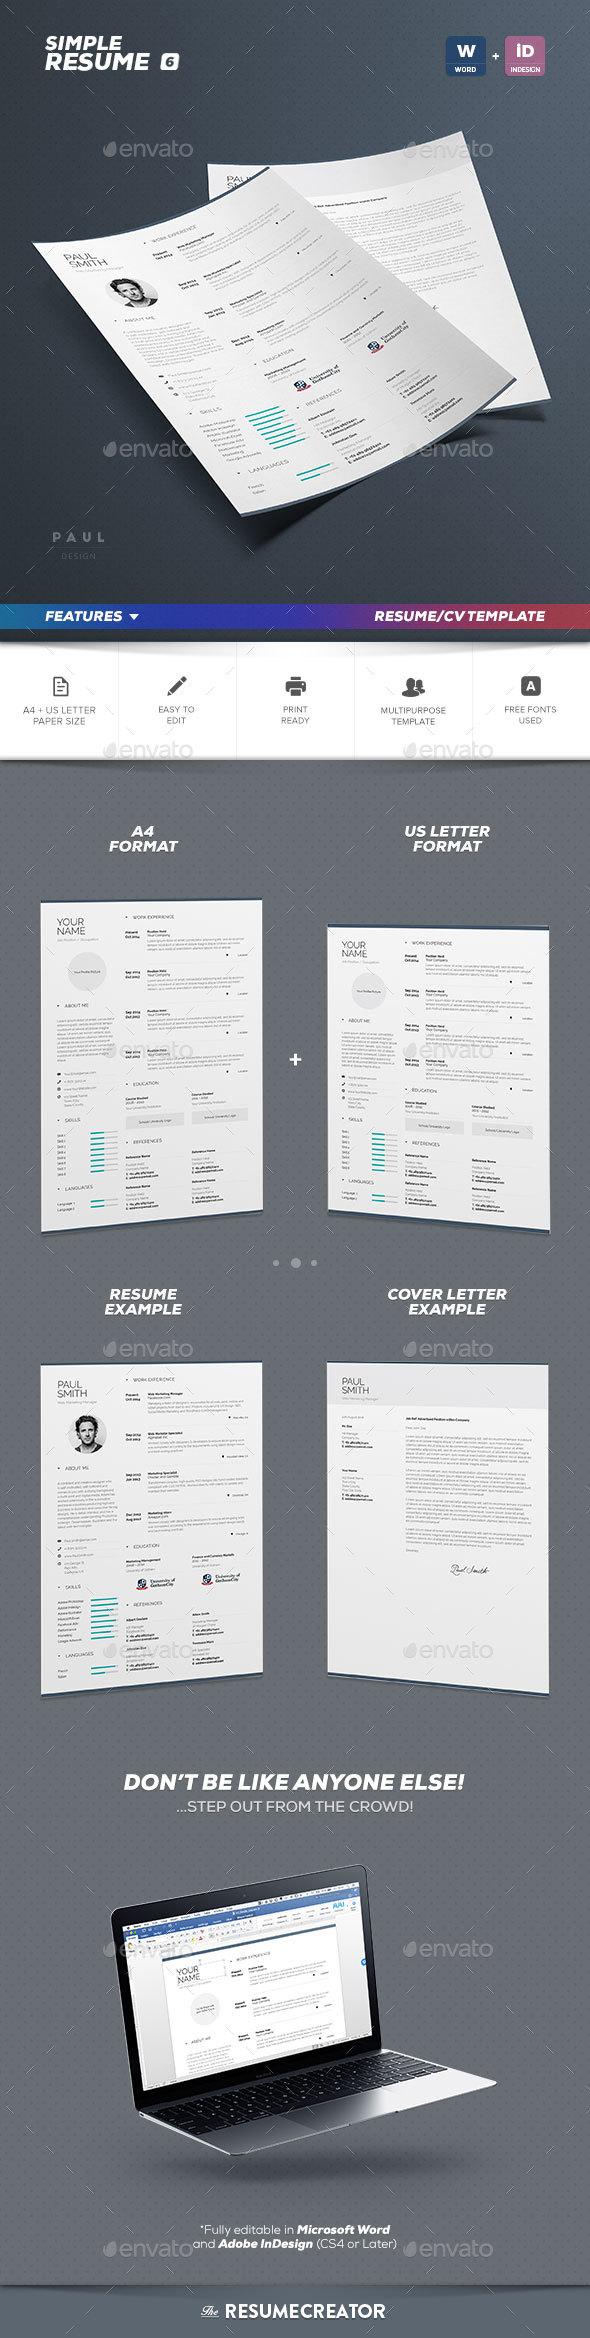 Simple Resume/Cv Volume 6 - Resumes Stationery